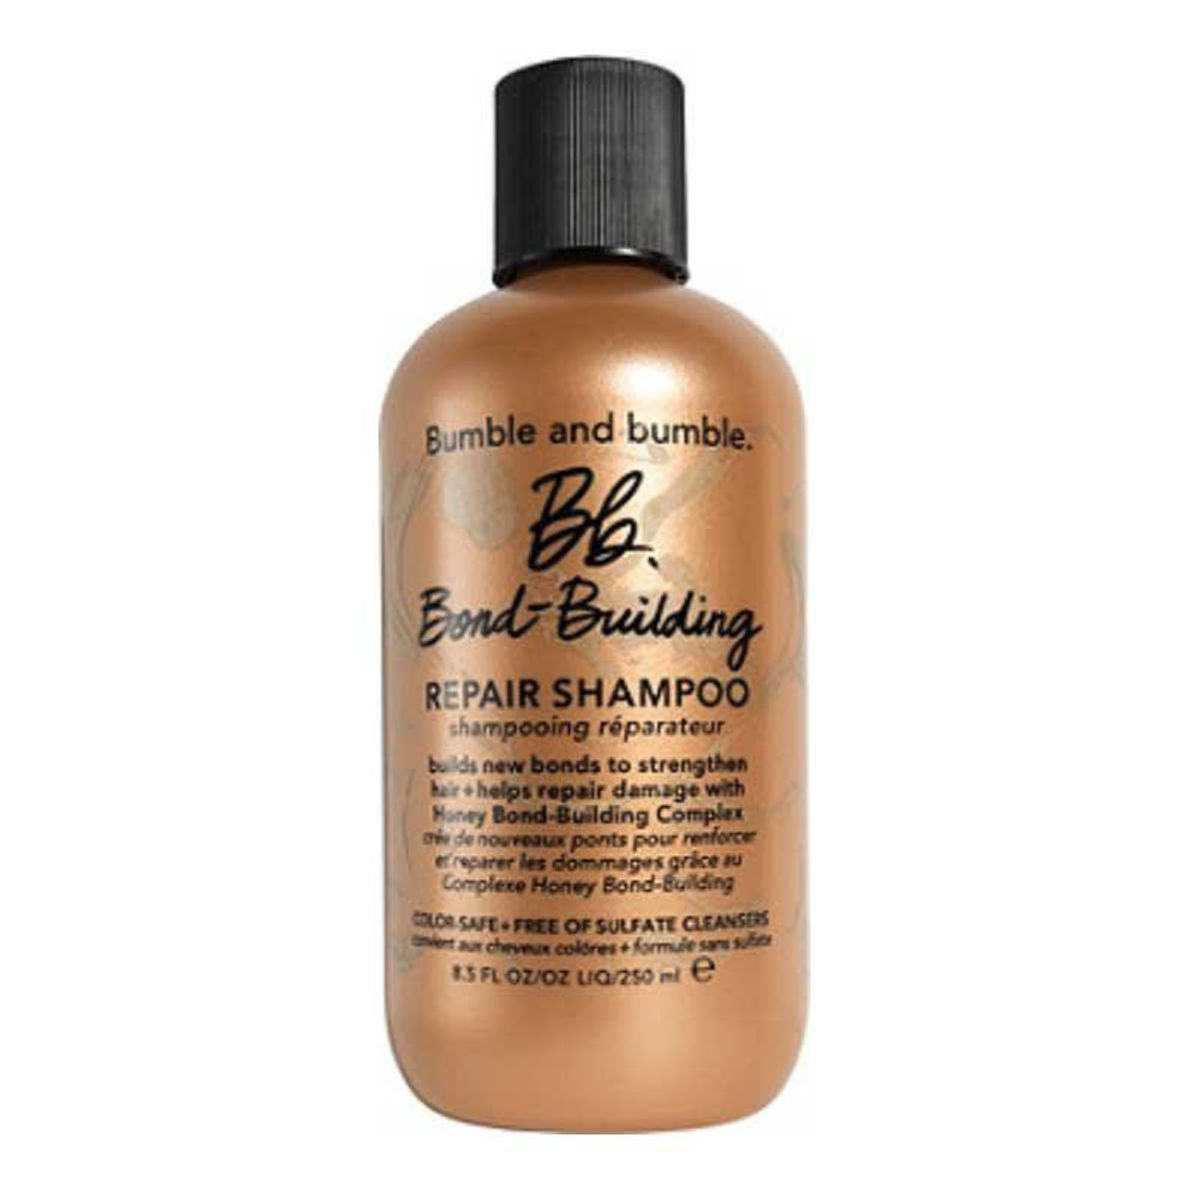 bumble and bumble bb bond building repair shampoo